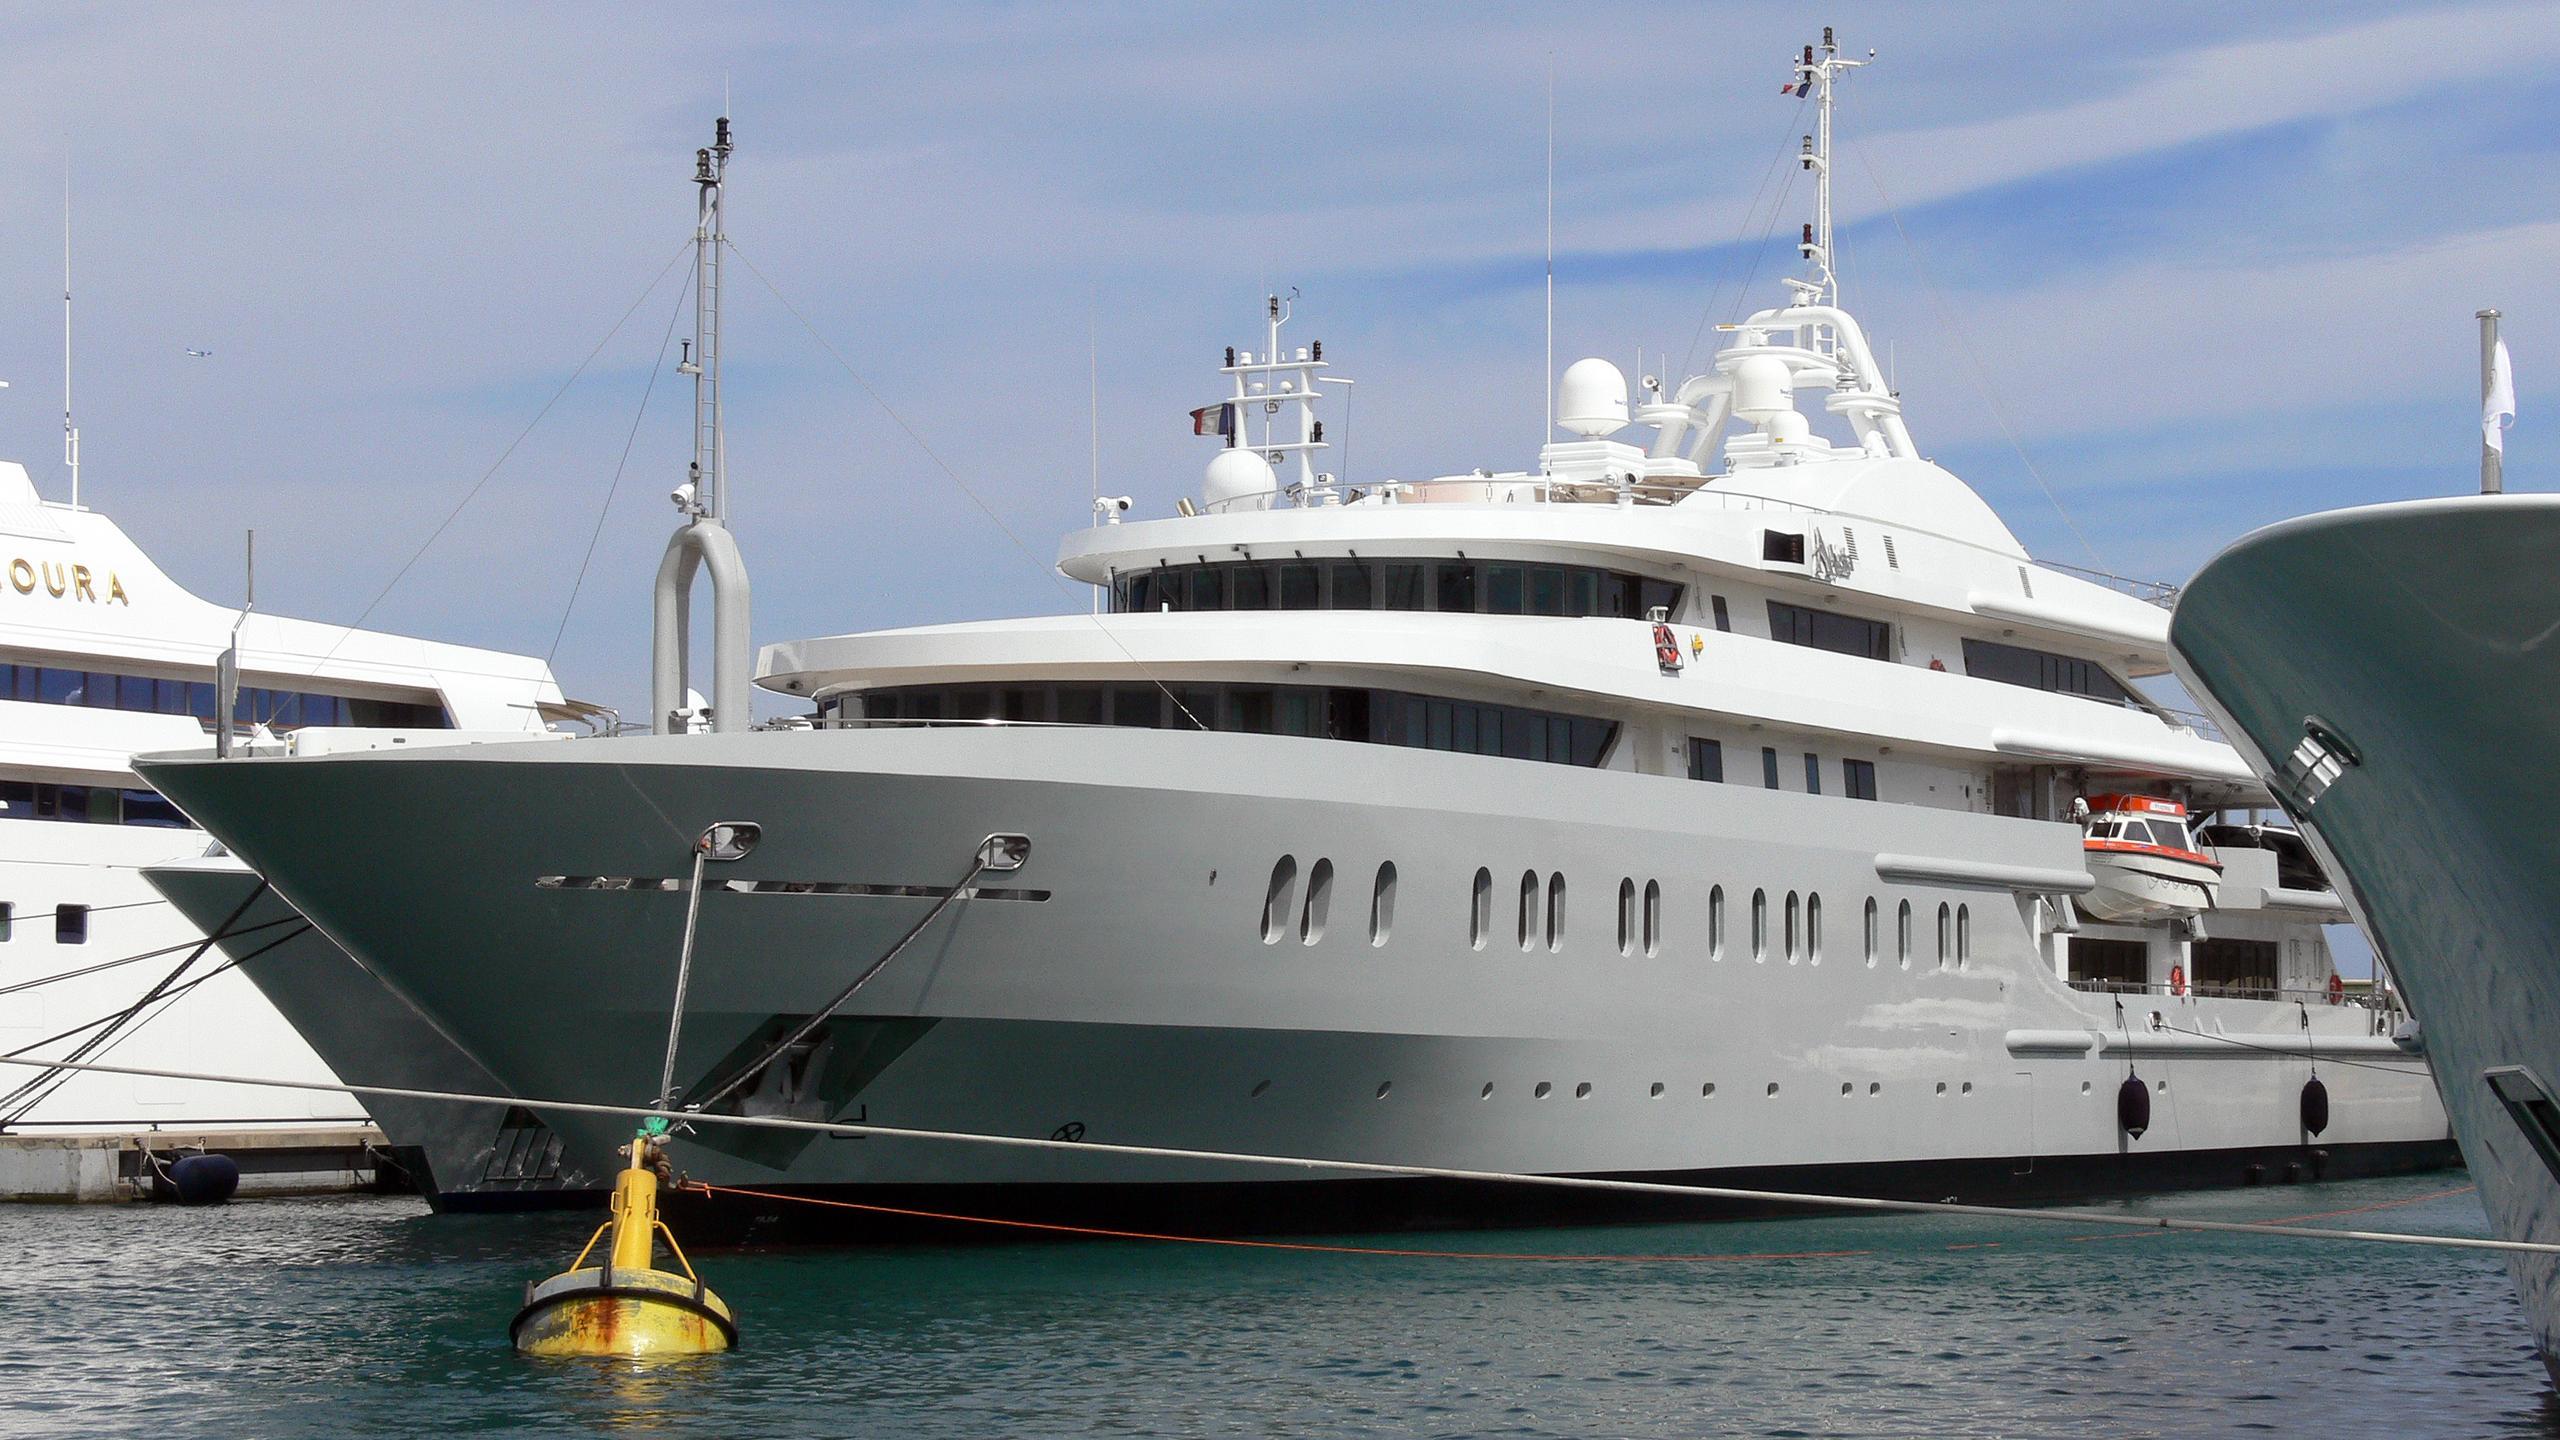 moonlight-ii-motor-yacht-neorion-2005-91m-half-profile-before-refit